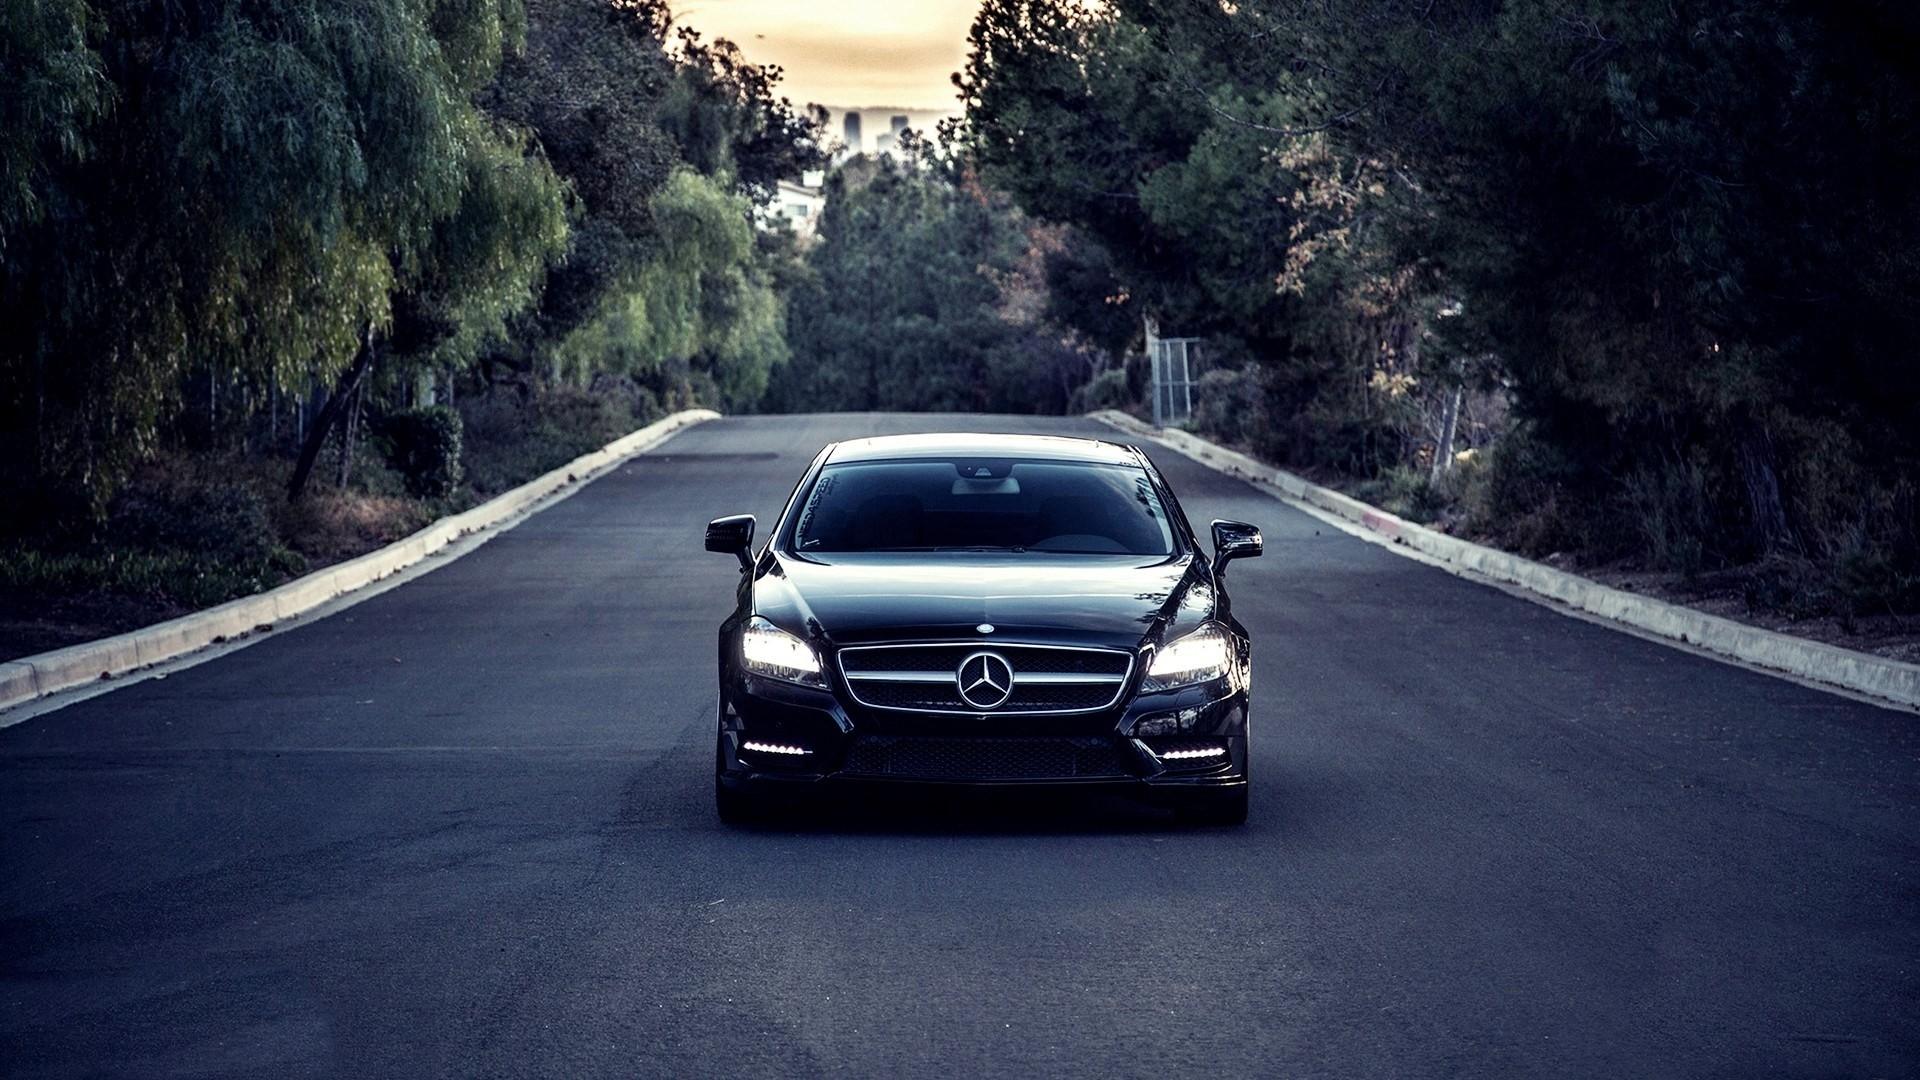 Mercedes Wallpaper Free Download